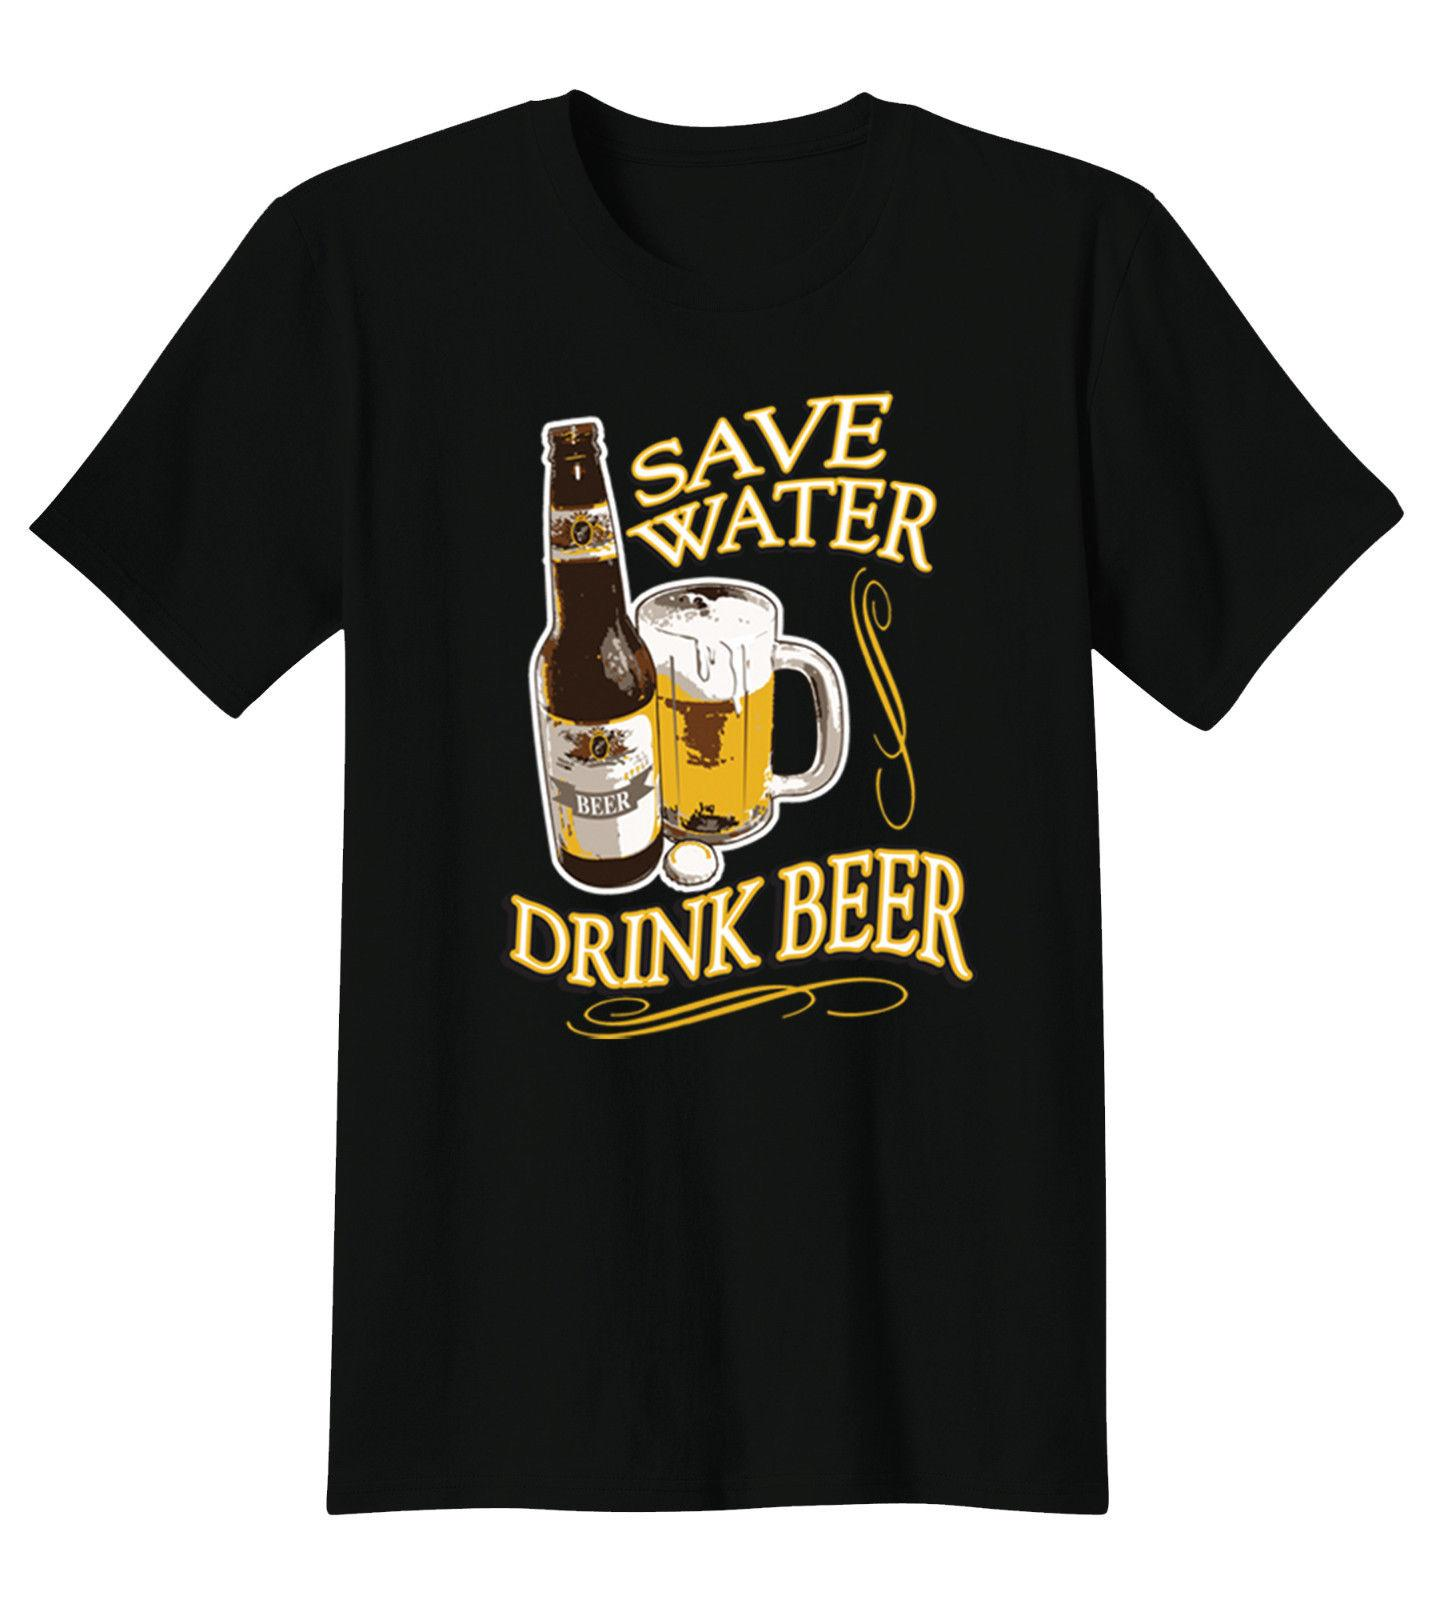 Compre Ahorre Agua Beba Cerveza Alcohol Botella Bebe Camiseta Divertida  Camiseta A  12.05 Del Lm32tshirt  55c27e4881dfe